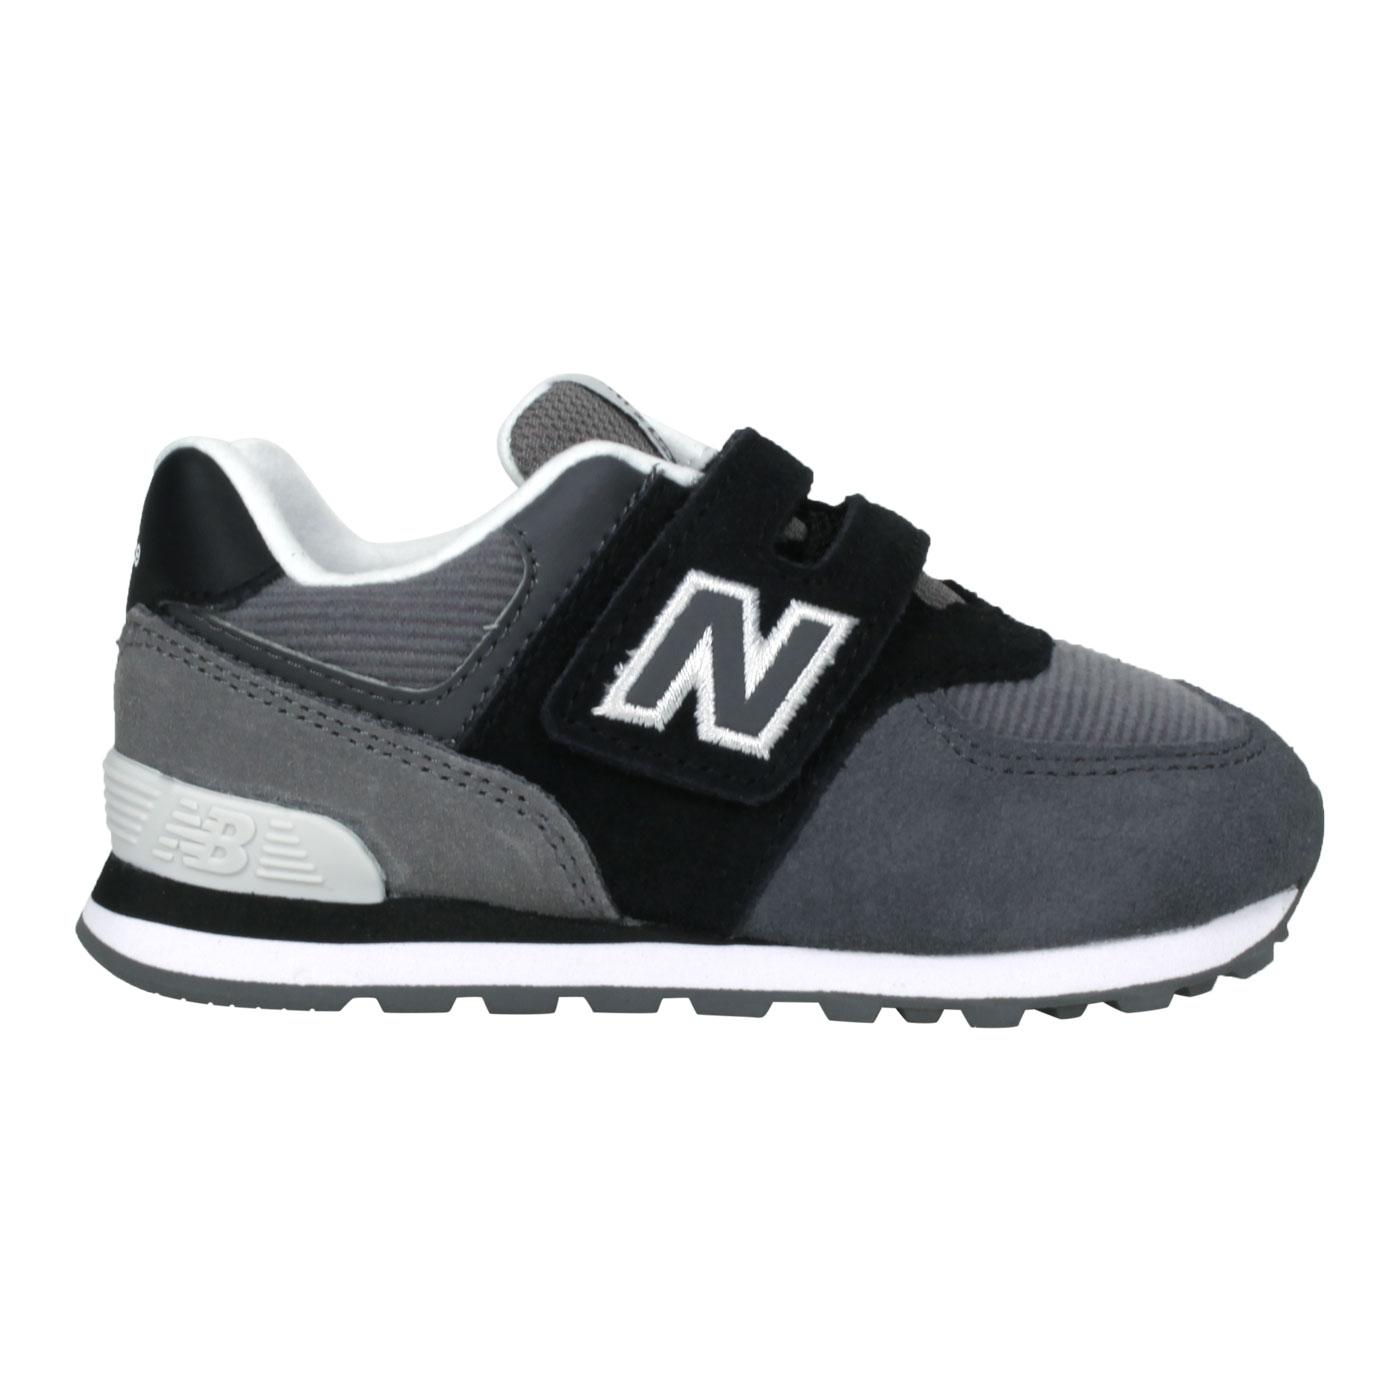 NEW BALANCE 小童休閒運動鞋-WIDE IV574WR1